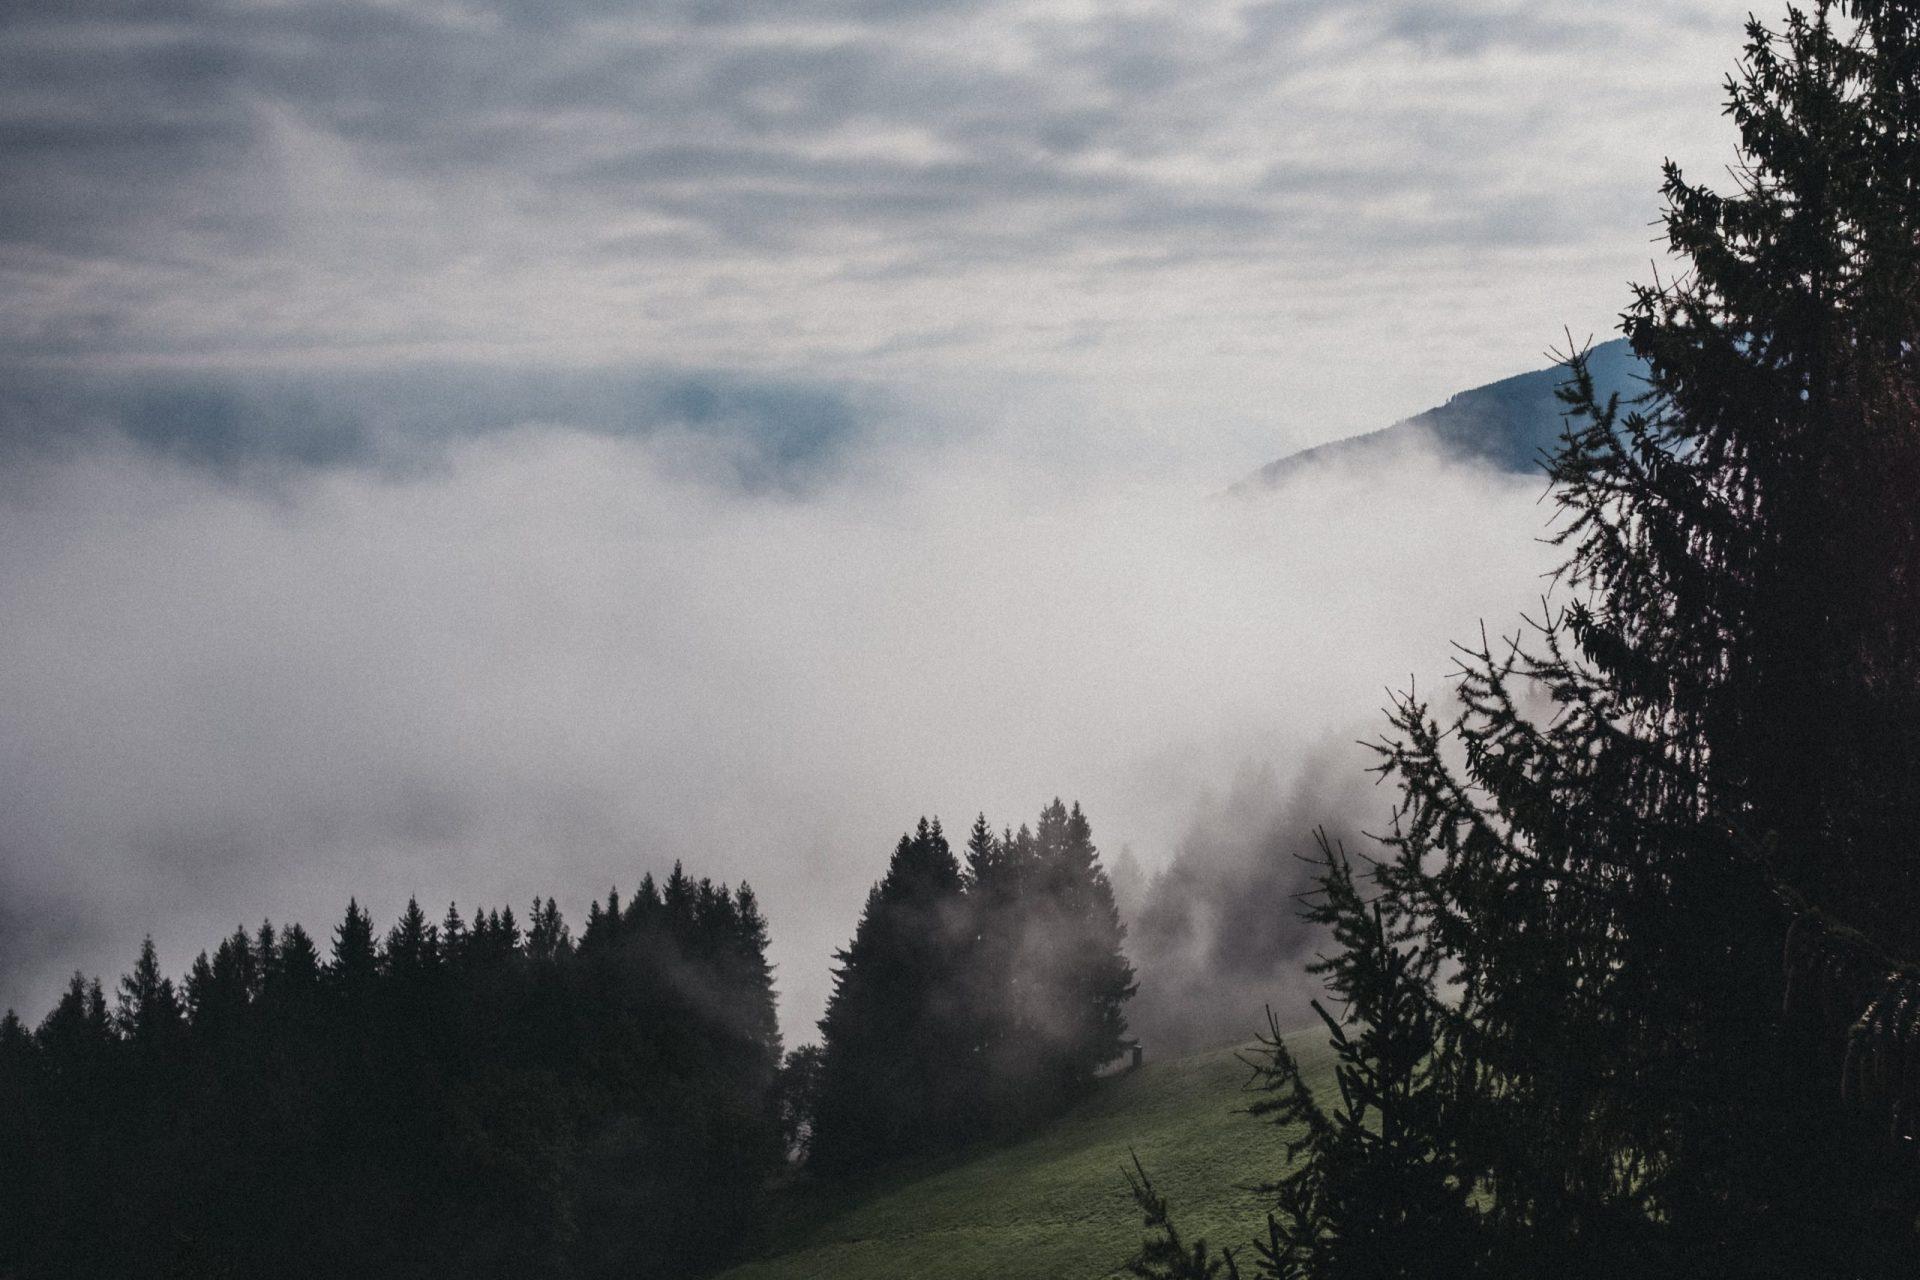 Berge_Nebel1_c_biohotel-rupertus-leogang_(DSF8720)_FotoHeldentheather-min